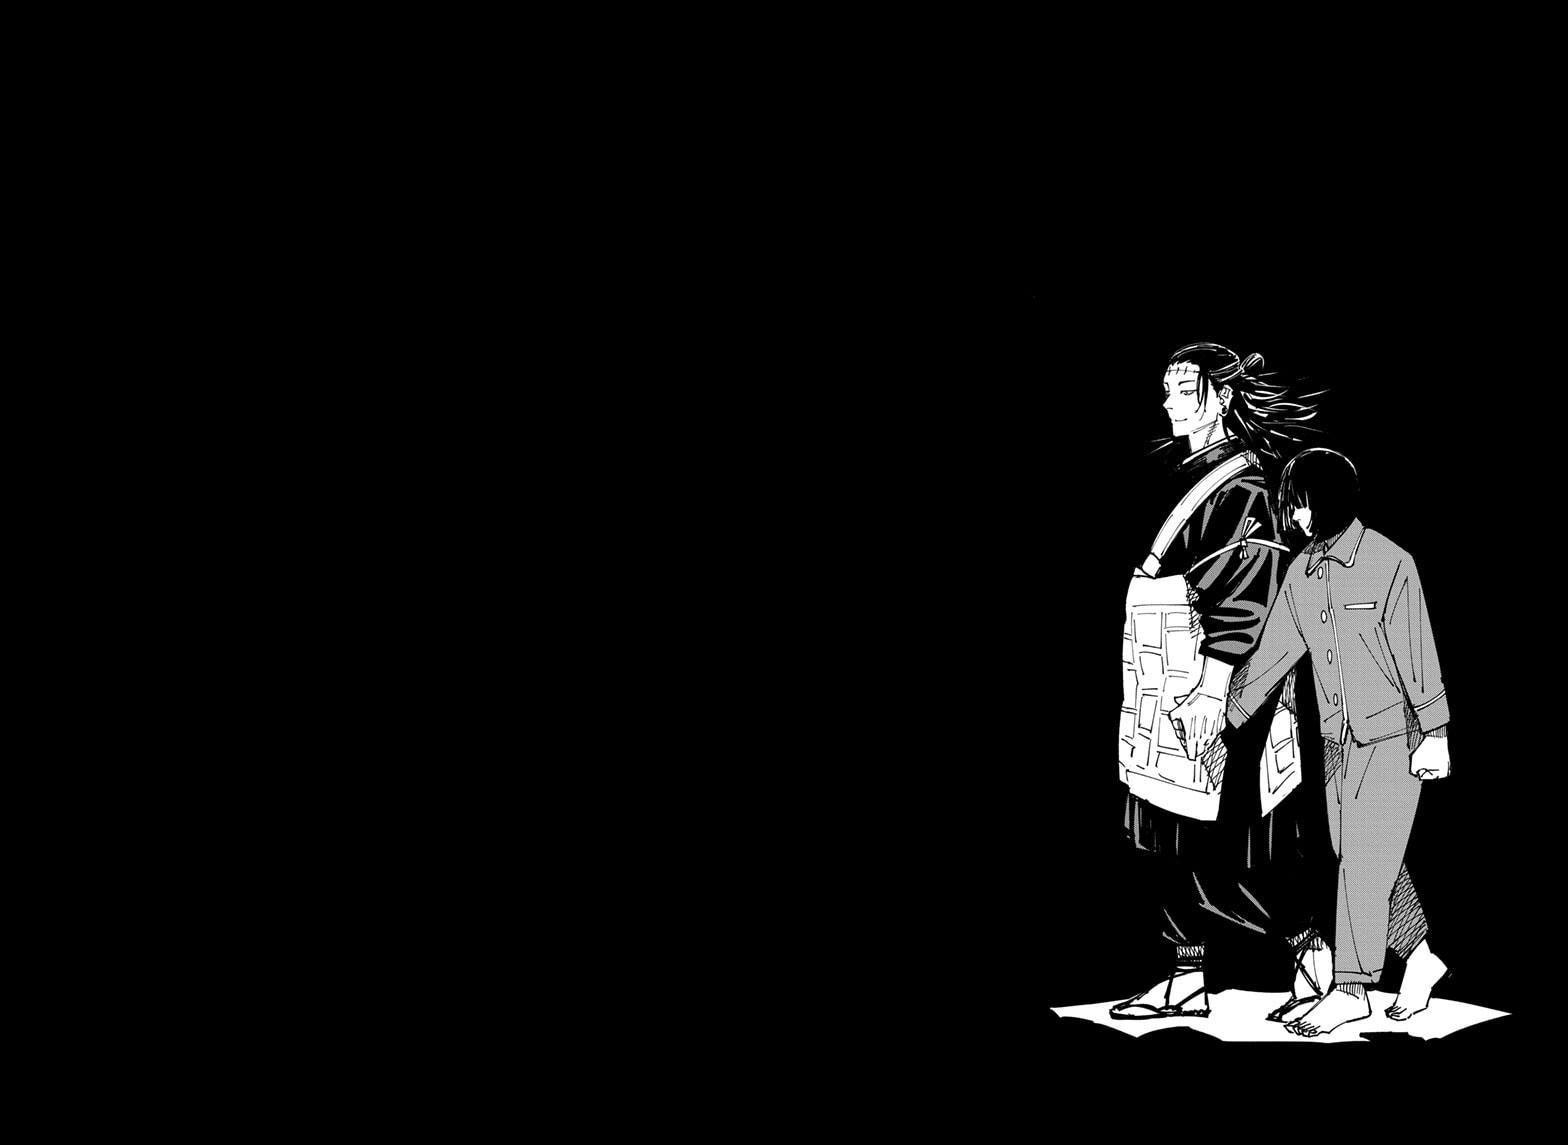 Featured image for Jujutsu Kaisen Chapter 160: Is Yuji Itadori the son of Kenjaku?